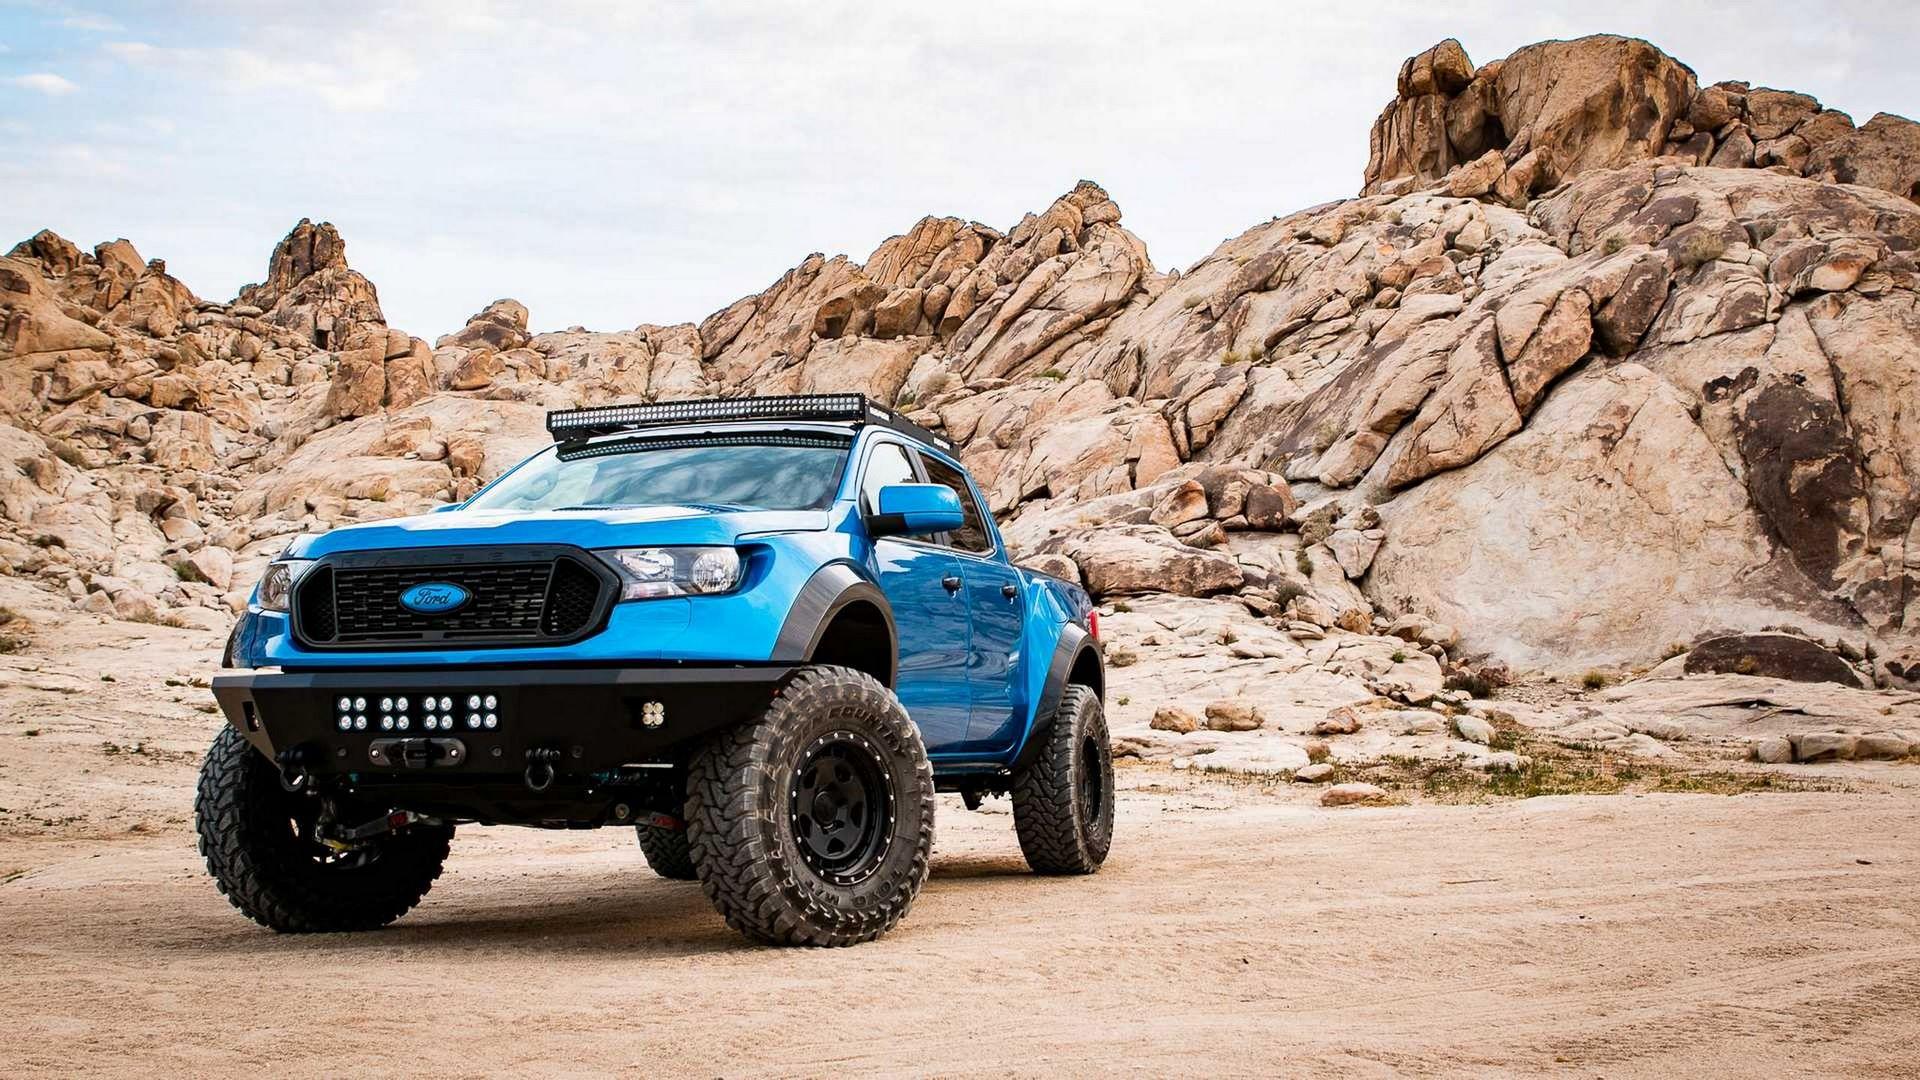 Ford-Ranger-Prorunner-By-APG-9